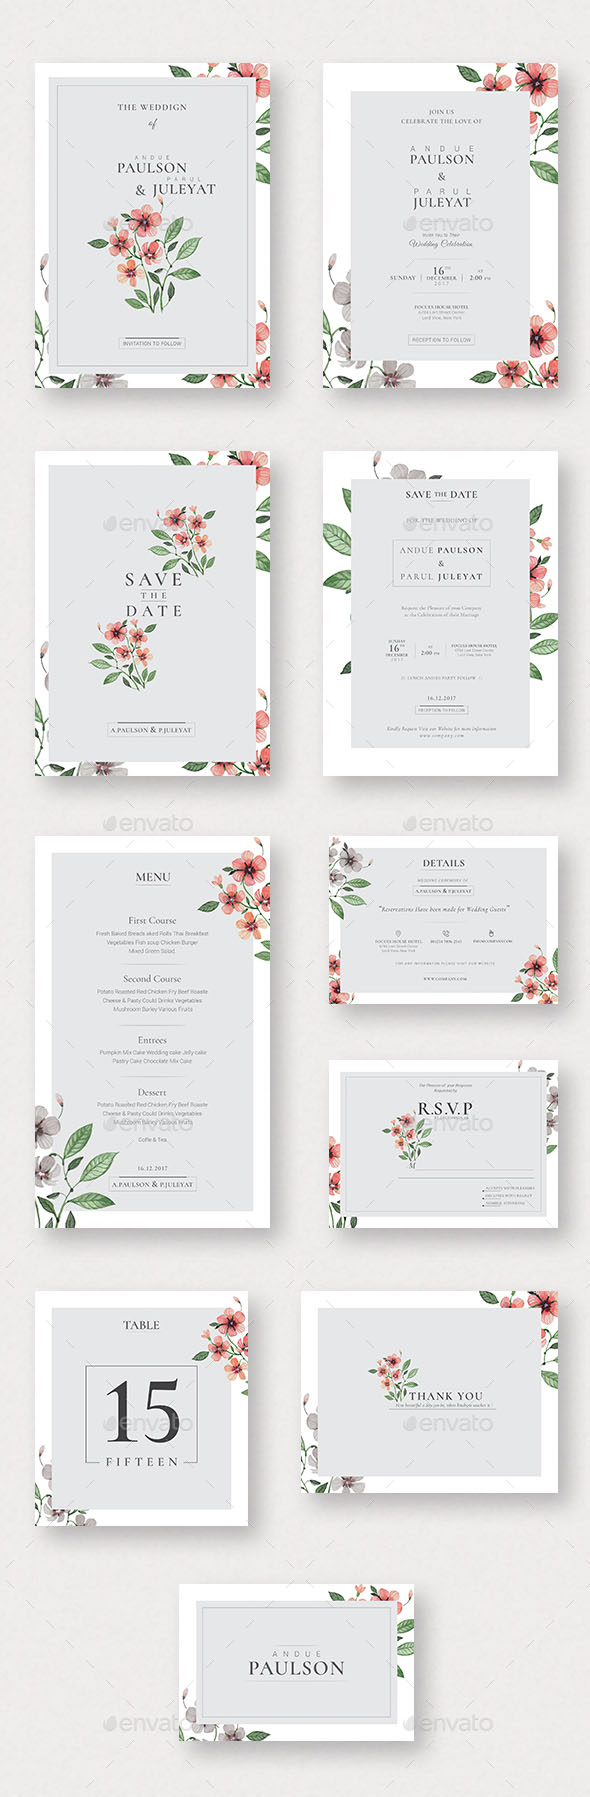 75 High Quality Wedding Invitation Card Designs 2020 Psd Indesign Vector